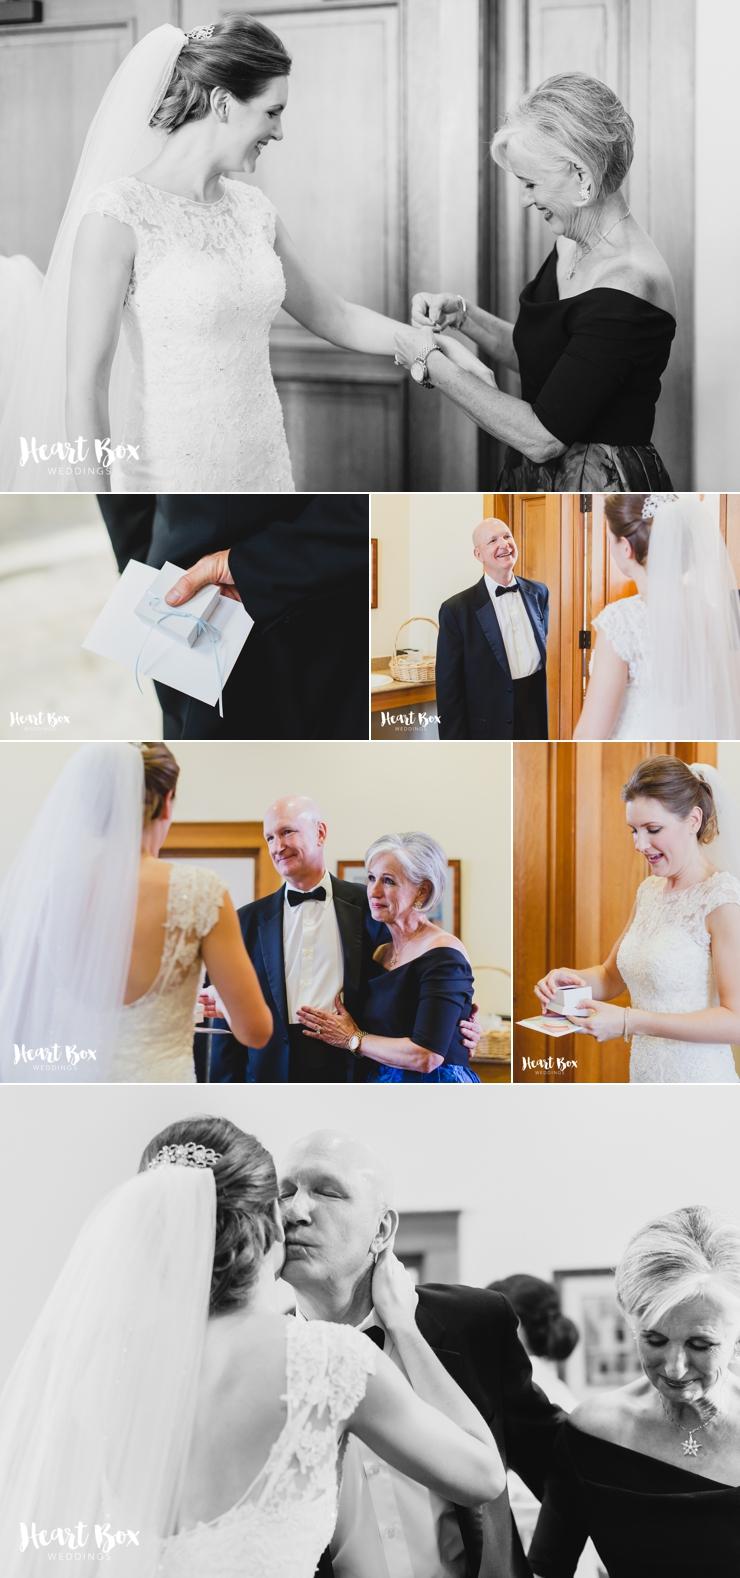 Anthony Wedding Blog Collages 5.jpg